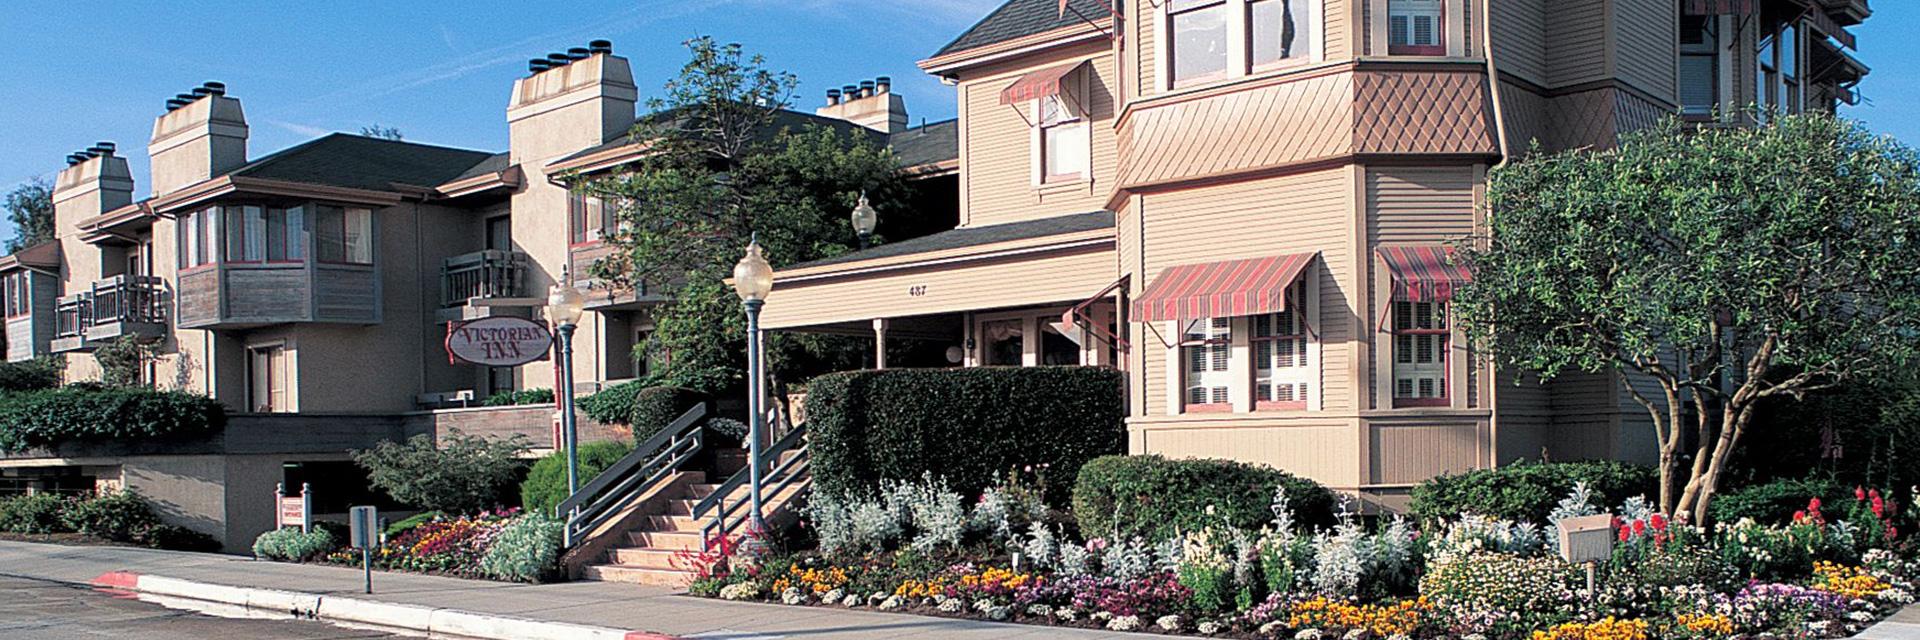 Historic Monterey Bay Hotel, california